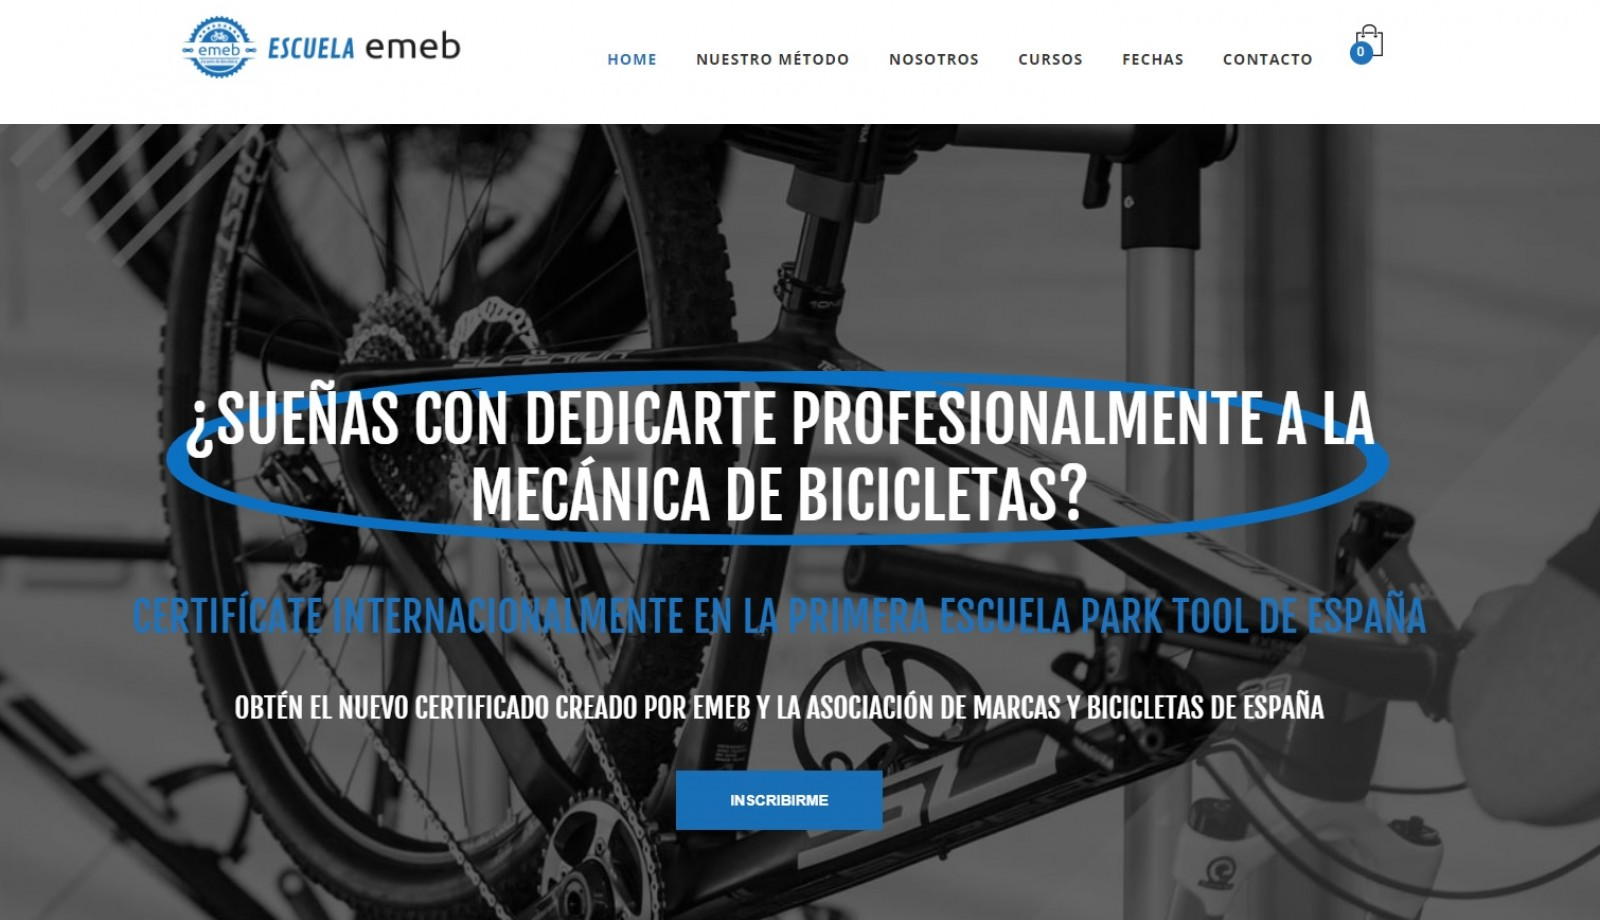 certificacion-mecanica-bicicletas-ambe-emeb/